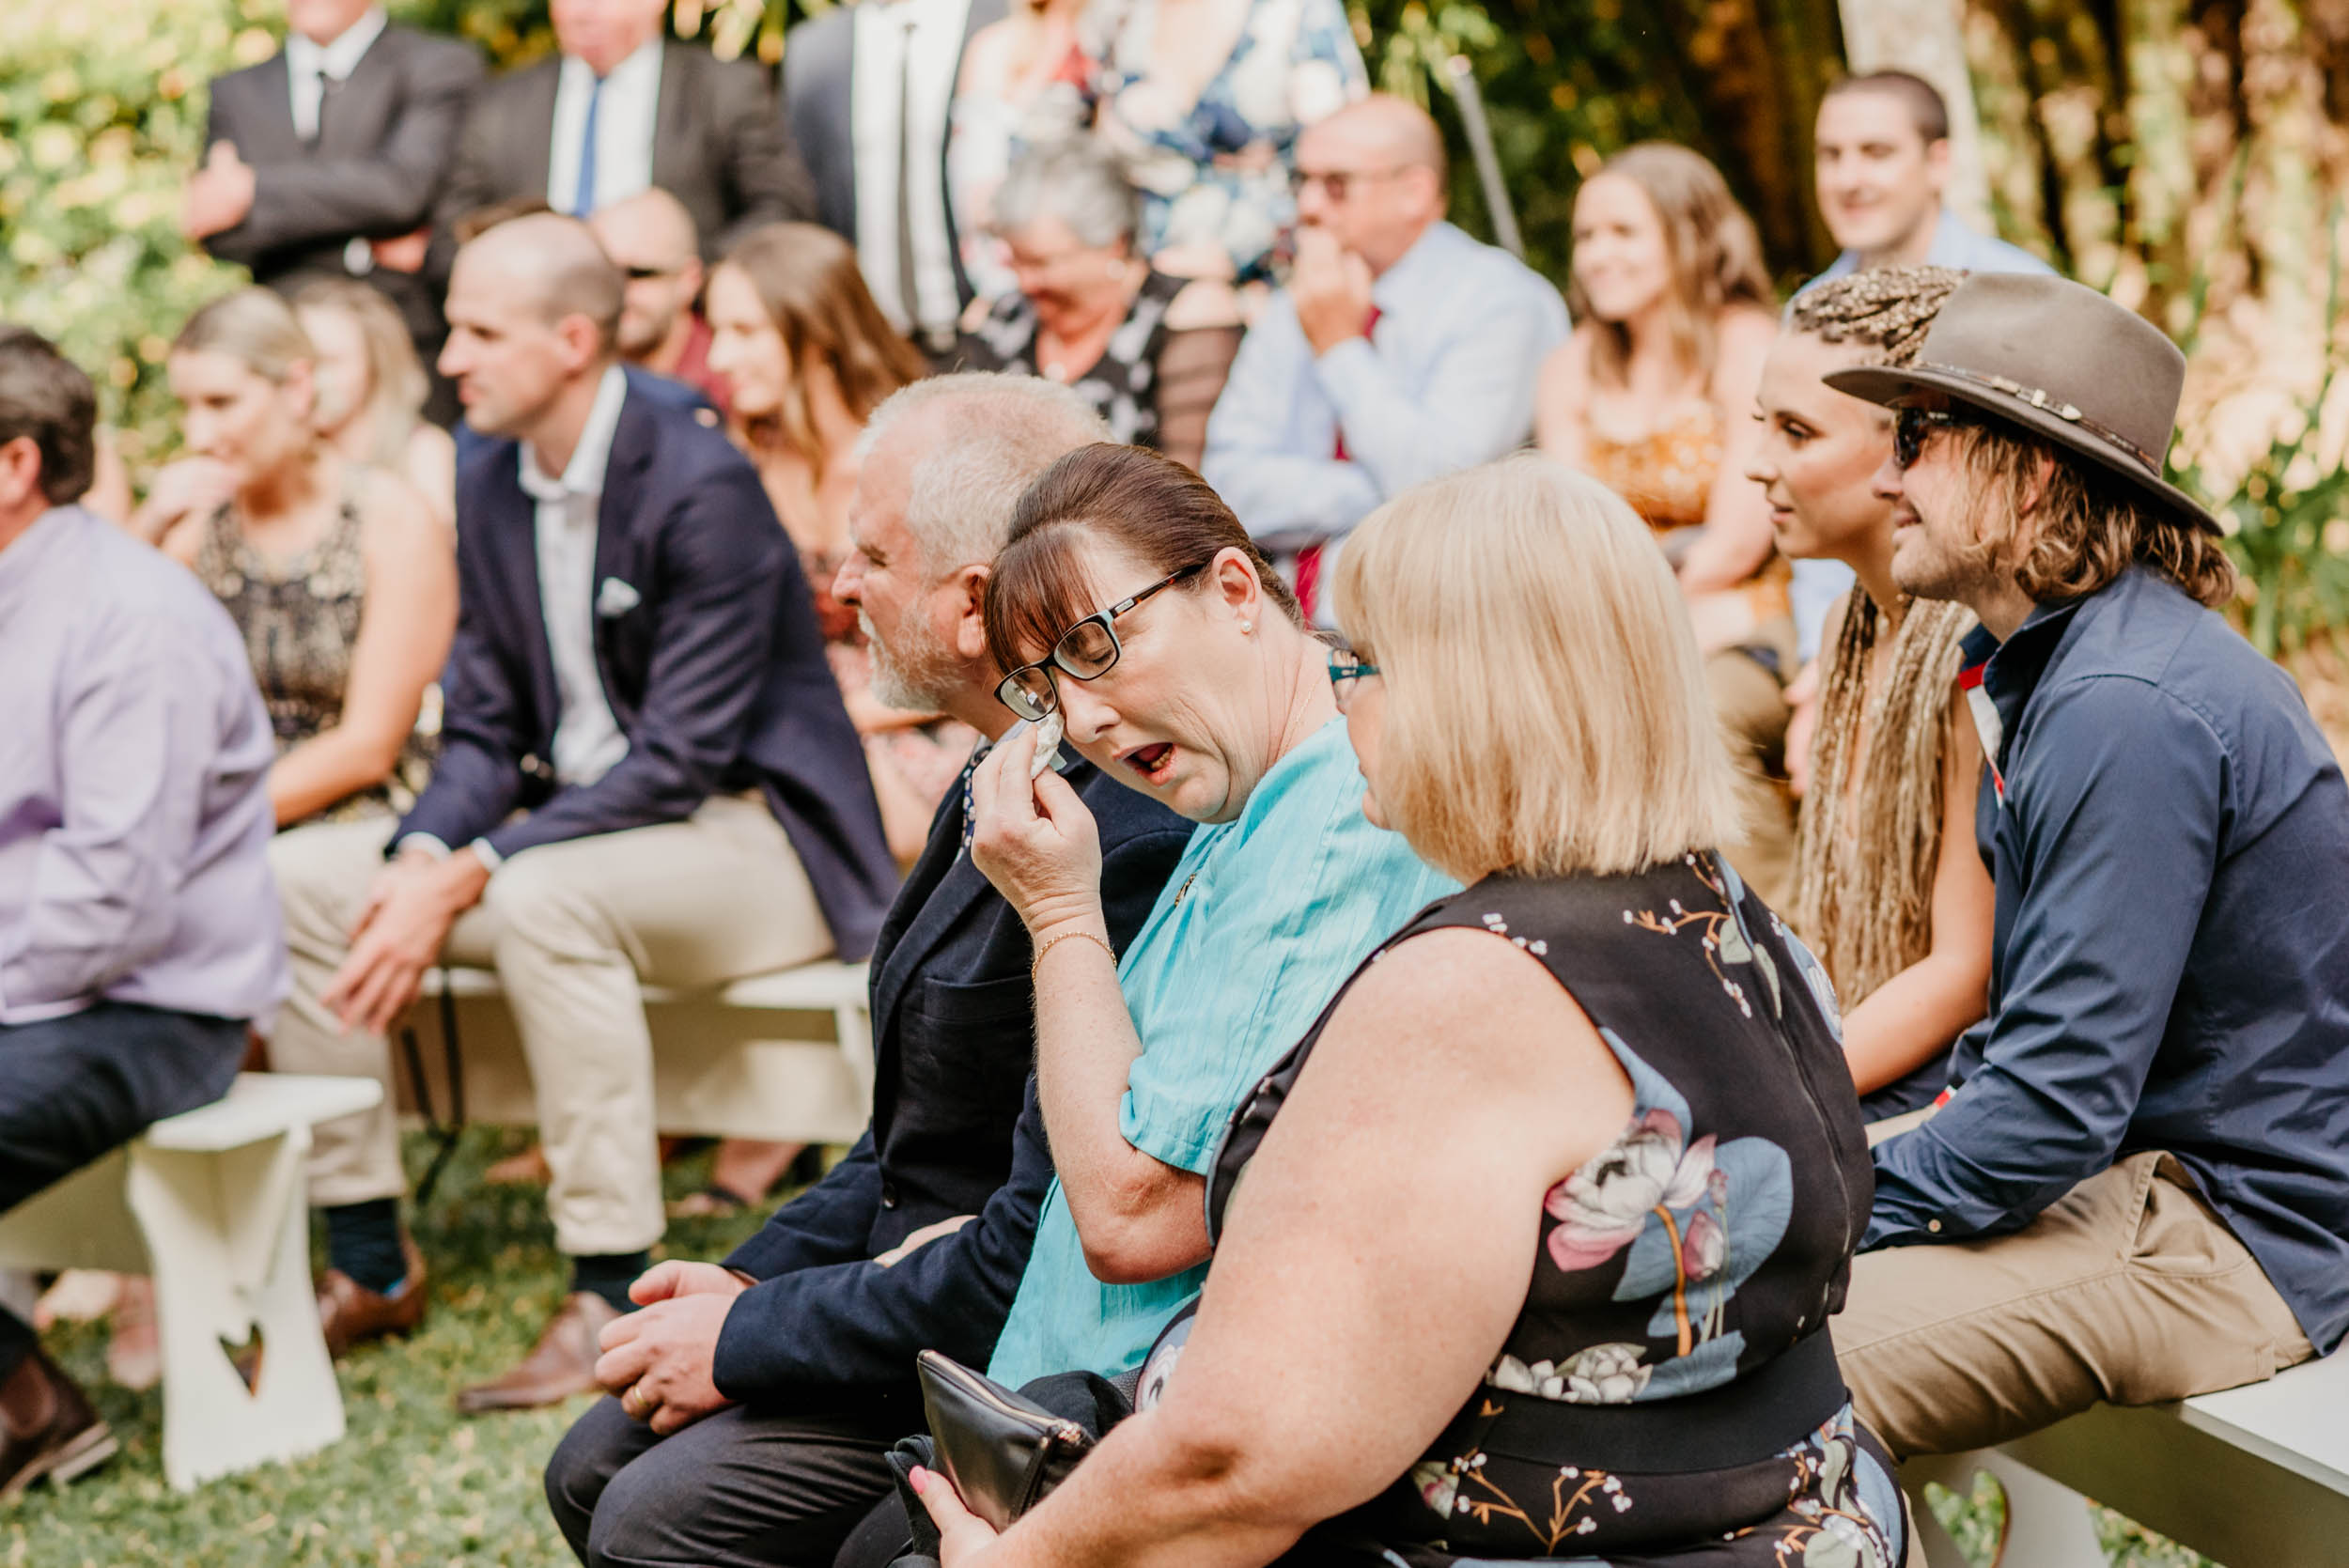 The Raw Photographer - Cairns Wedding Photographer - Laloli - Cairns Garden Wedding - Wedding Dress-33.jpg